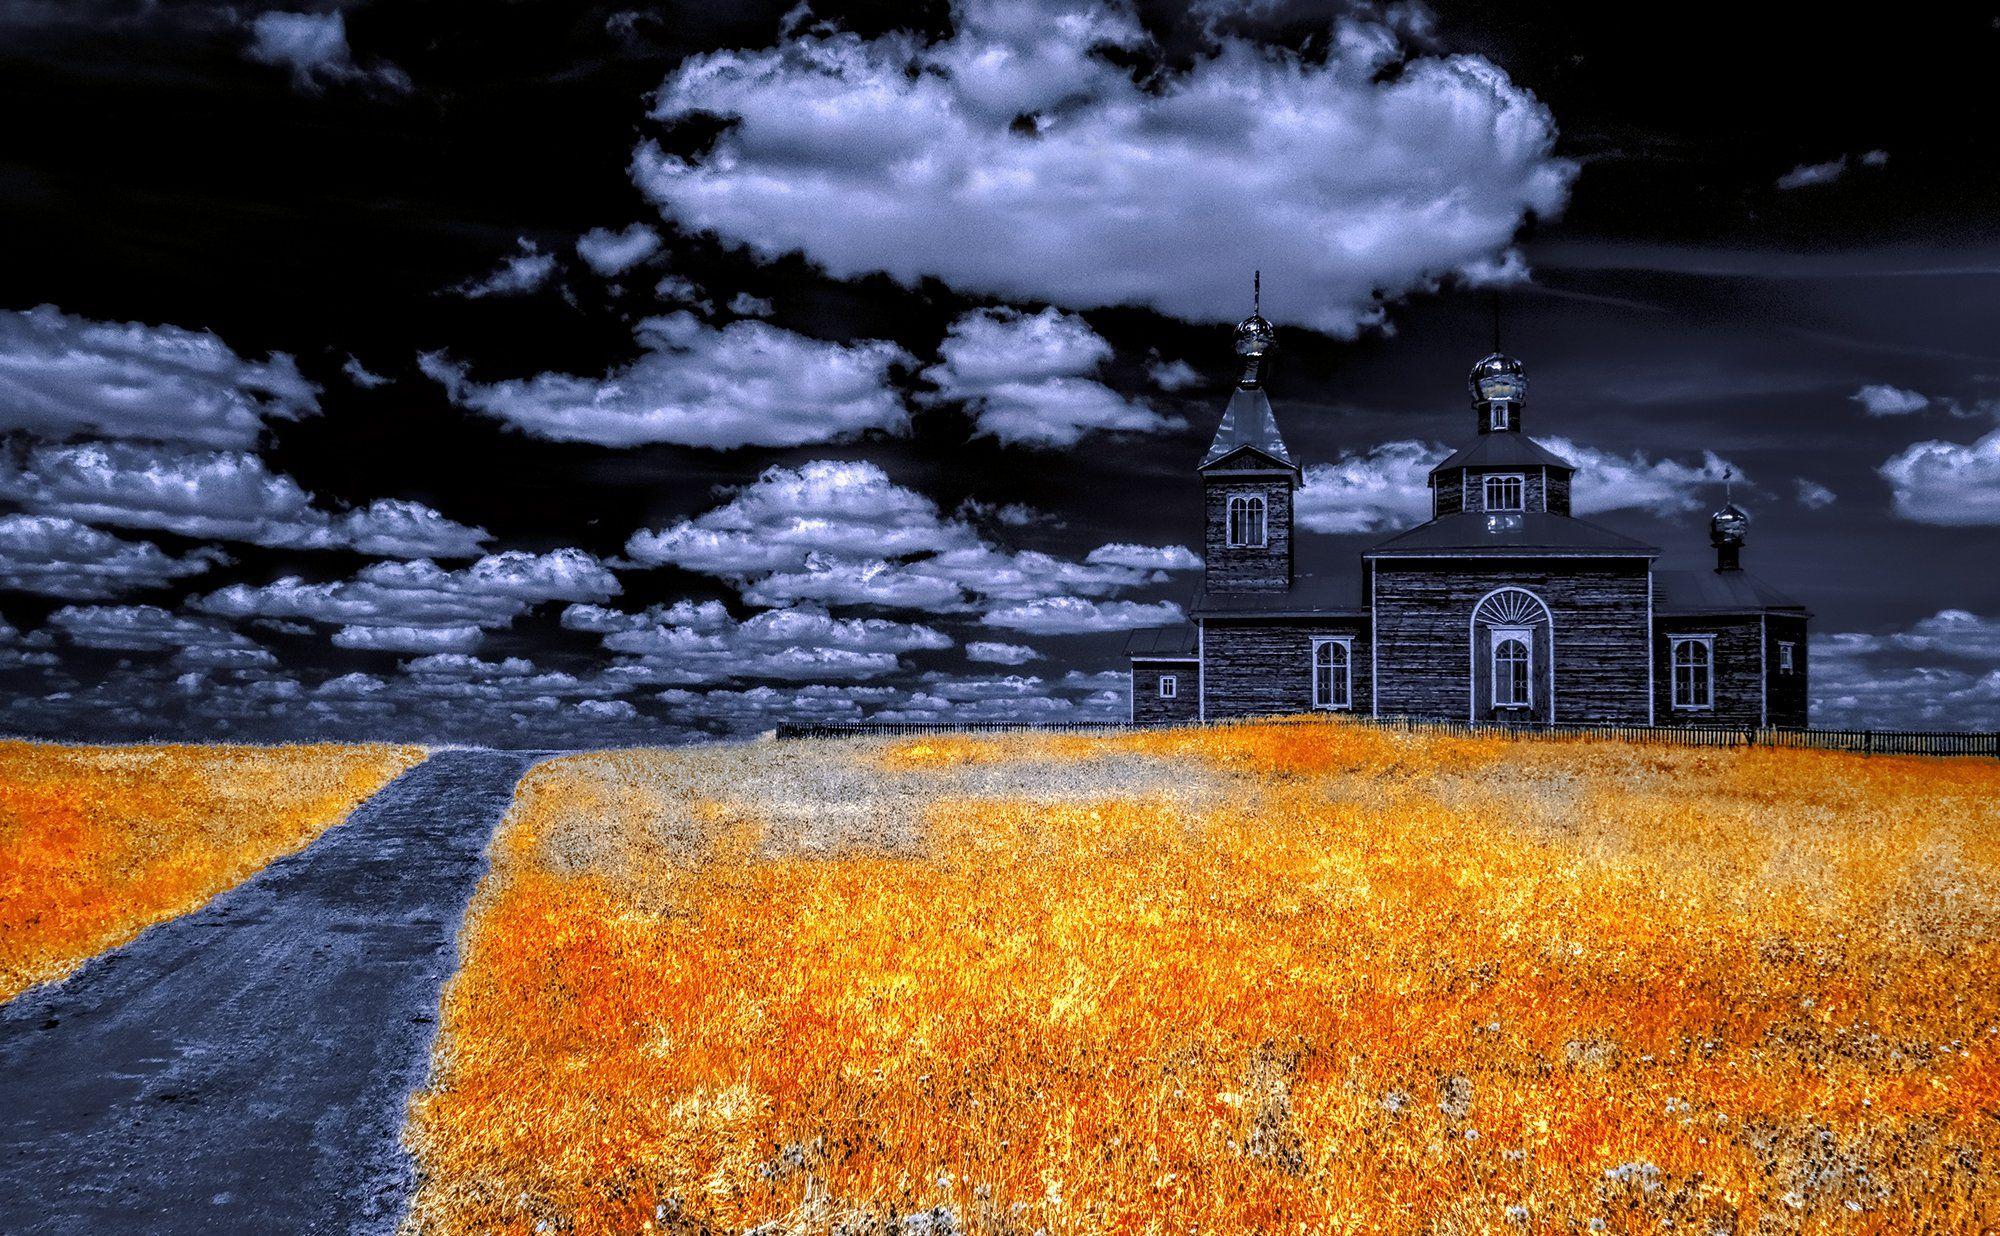 infrared,ик-фото,инфракрасное фото, инфракрасная фотография, пейзаж, весна, Sixten ( Сергей )